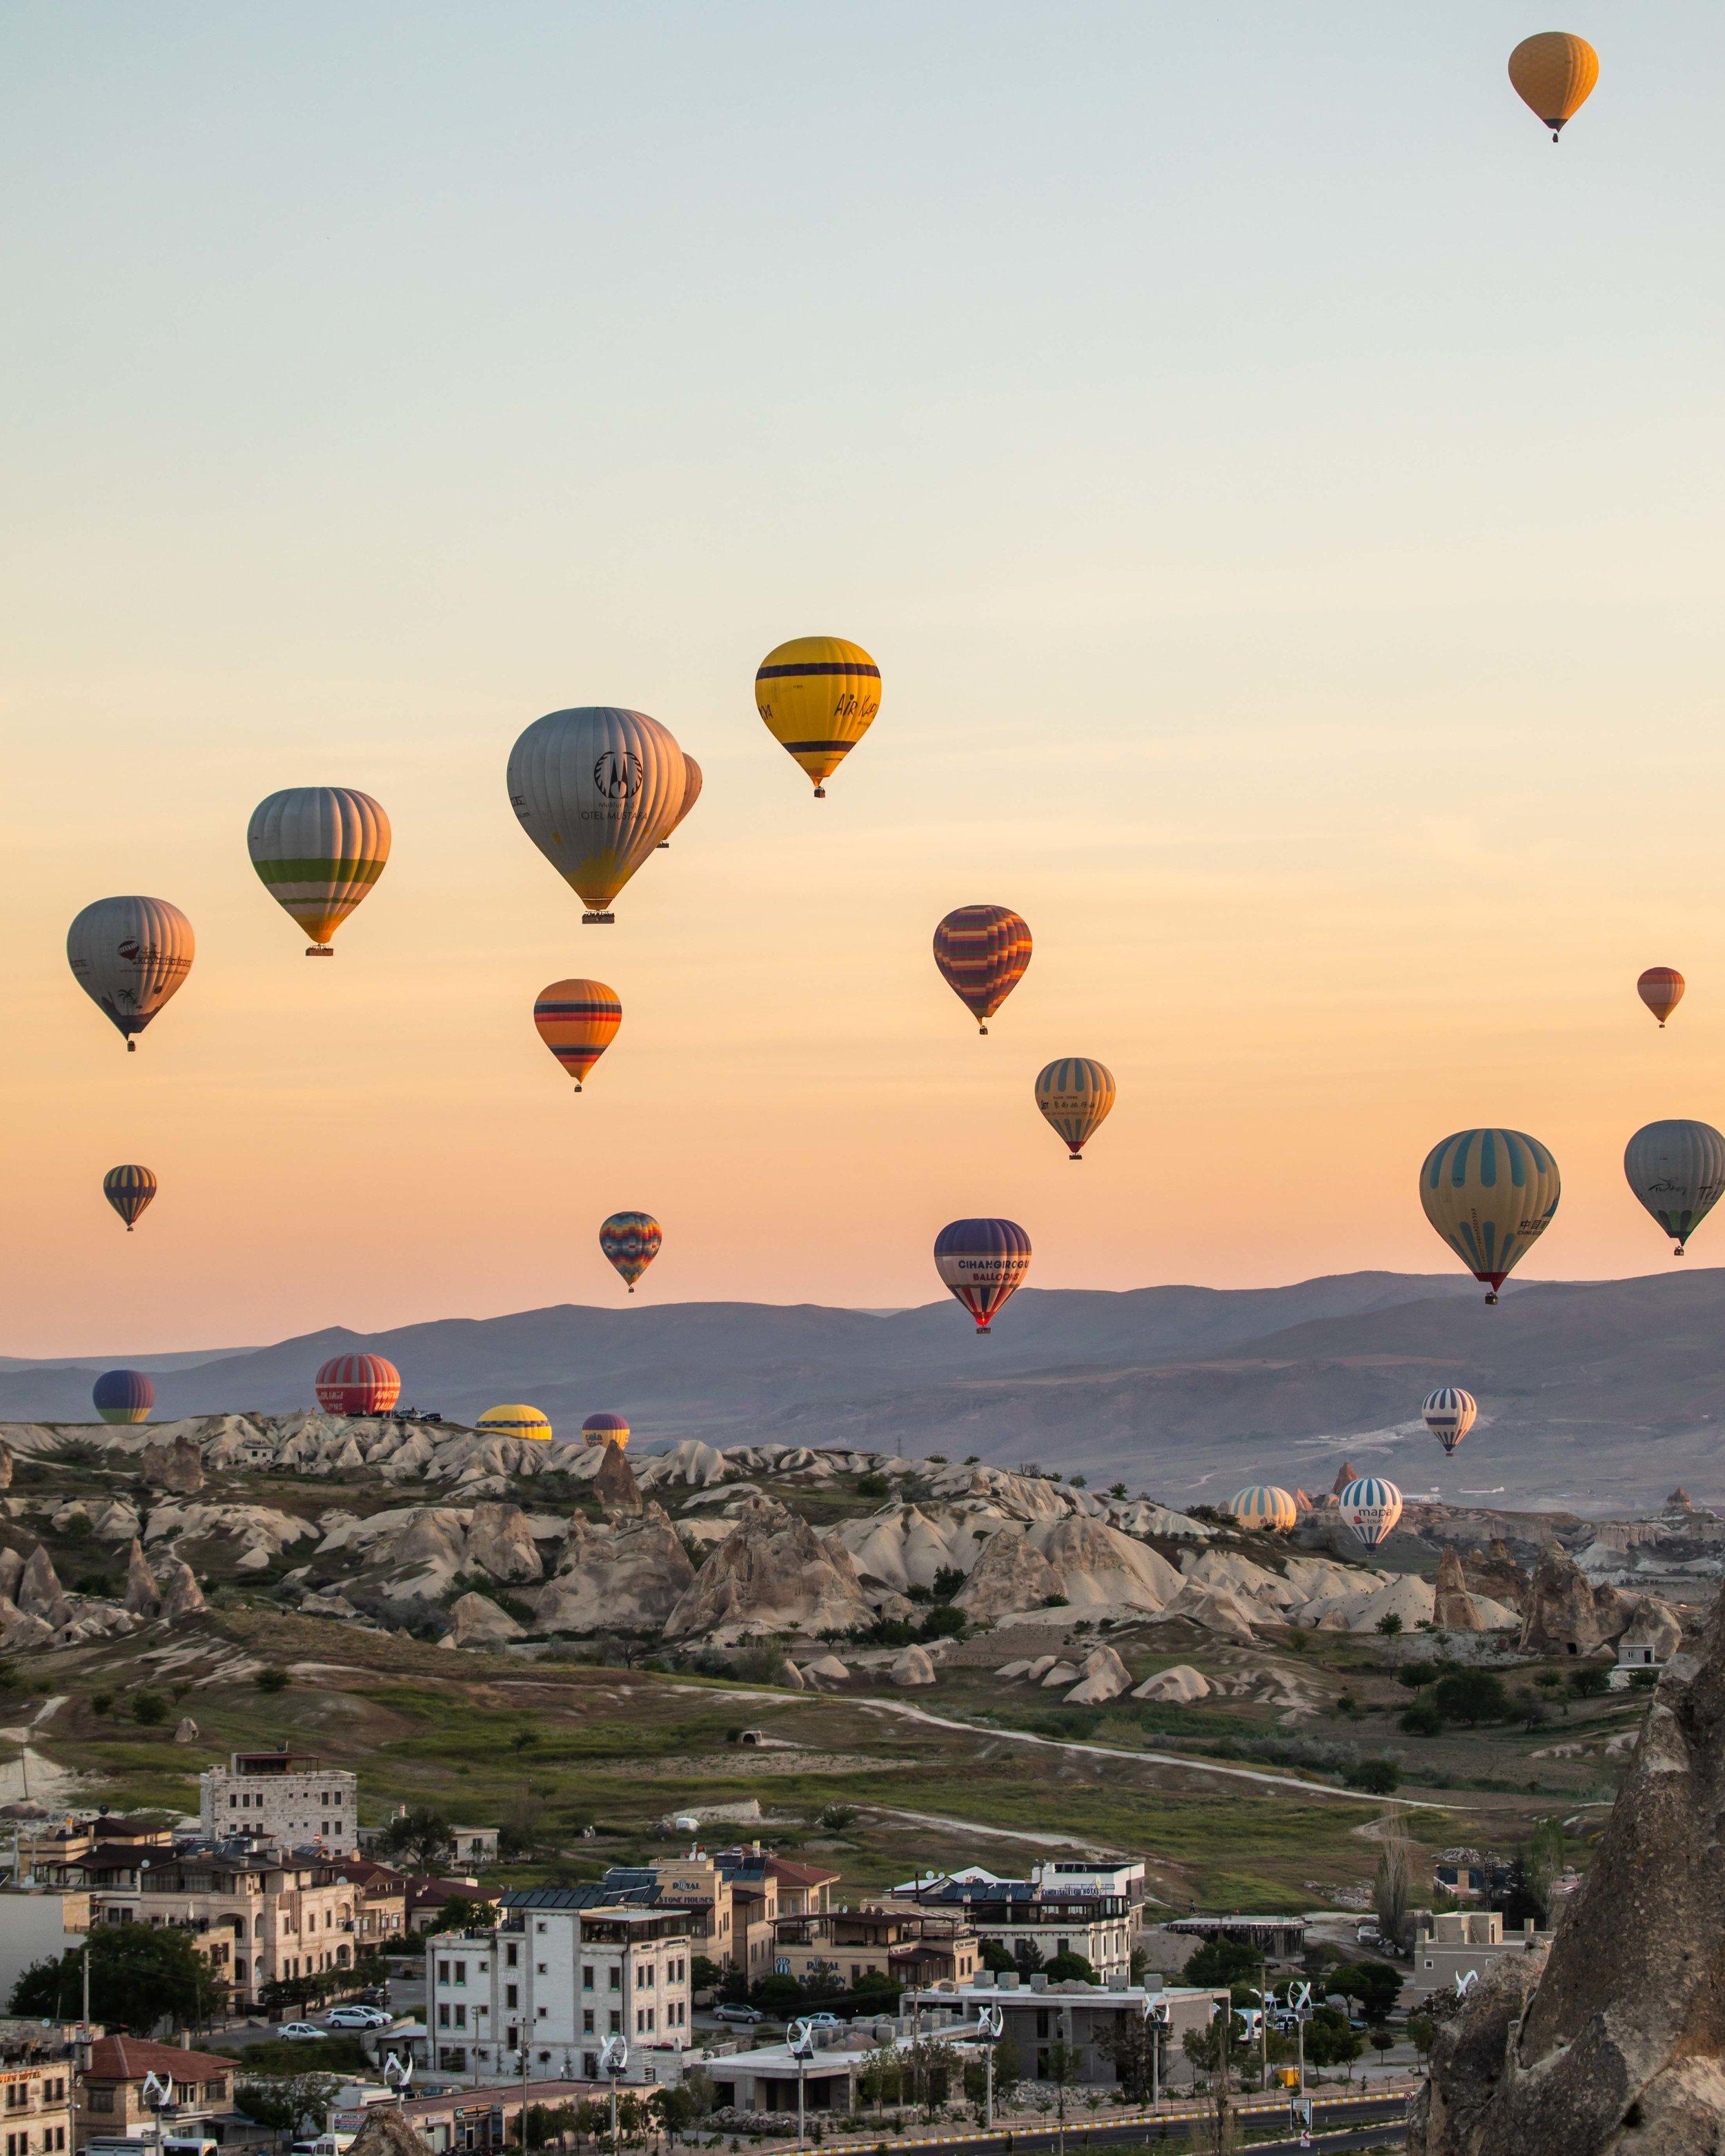 Take a balloon ride - things to do in Cappadocia